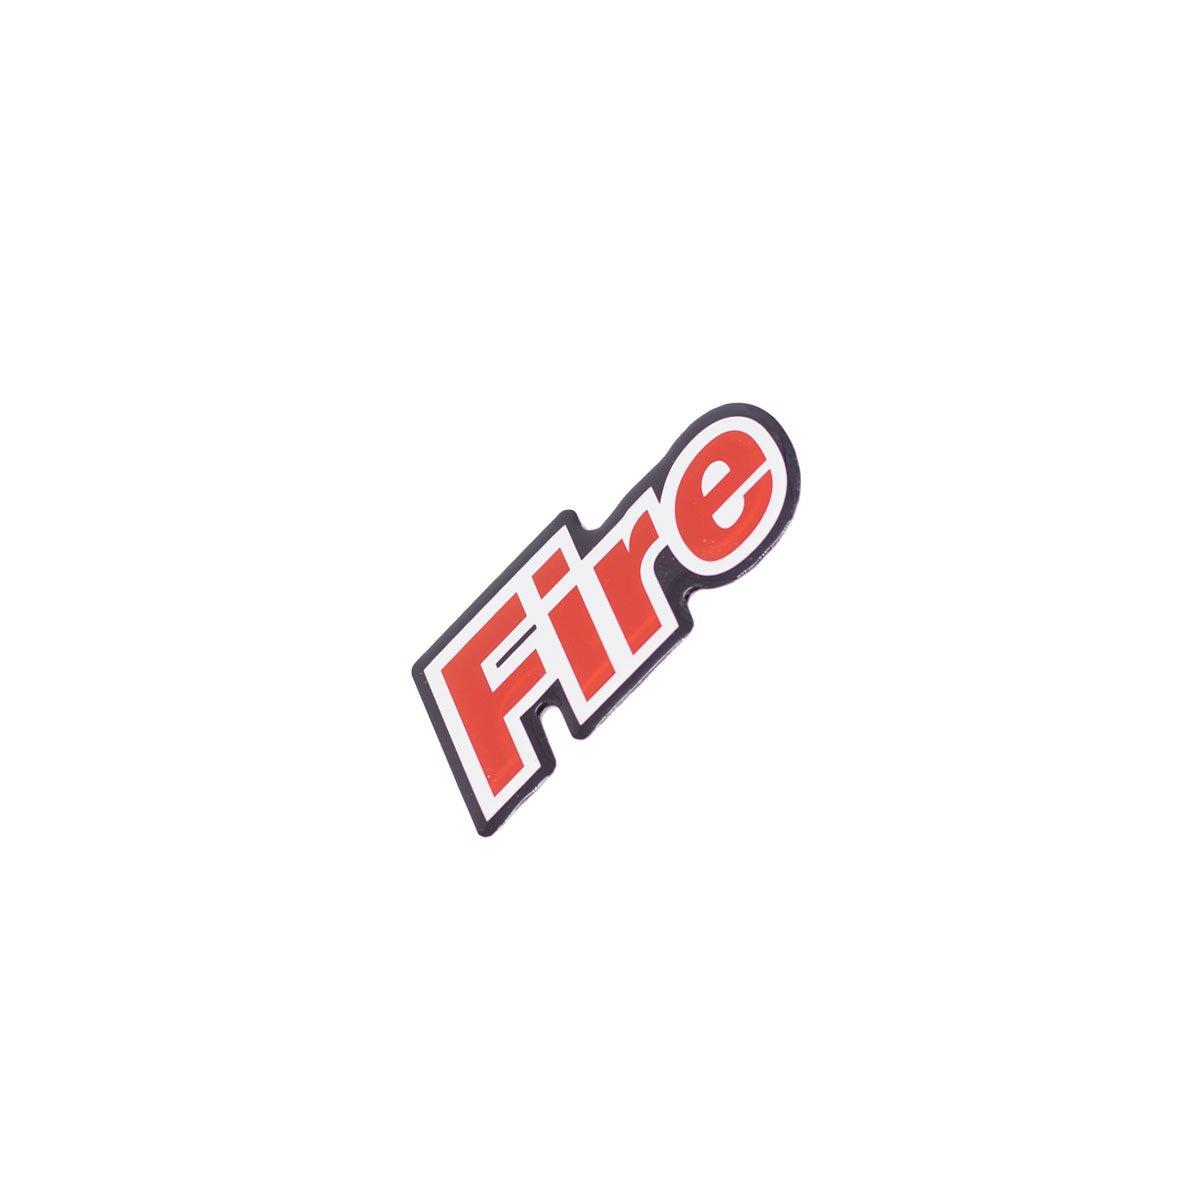 Emblema Fire Lateral (Resinado)